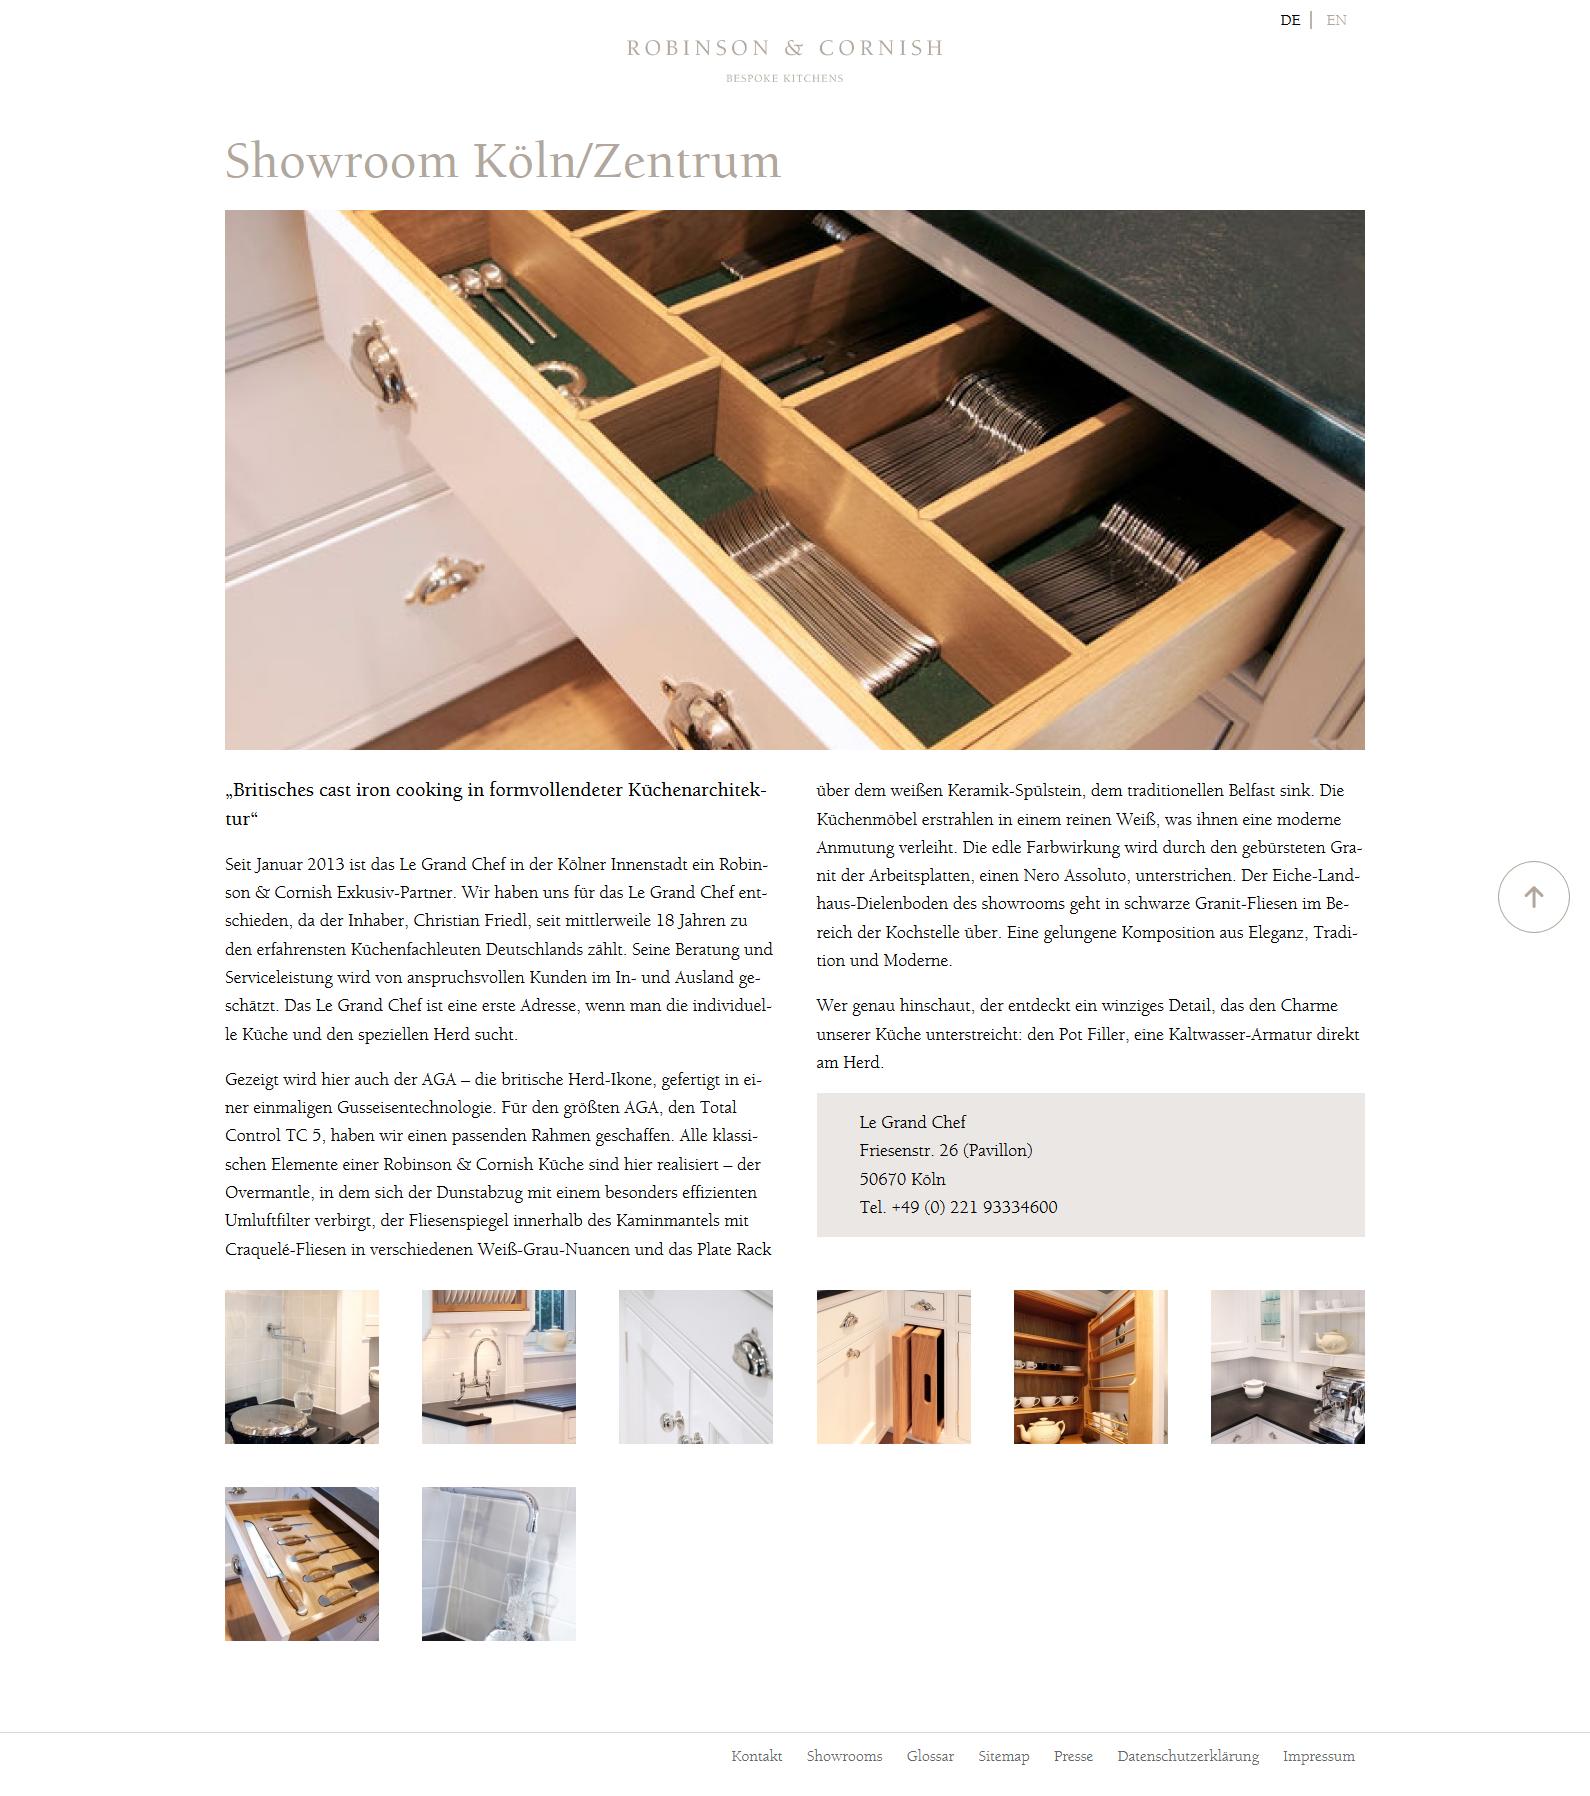 Referenz Drupal Cms Webdesign Robinson Cornish Bespoke Kitchens